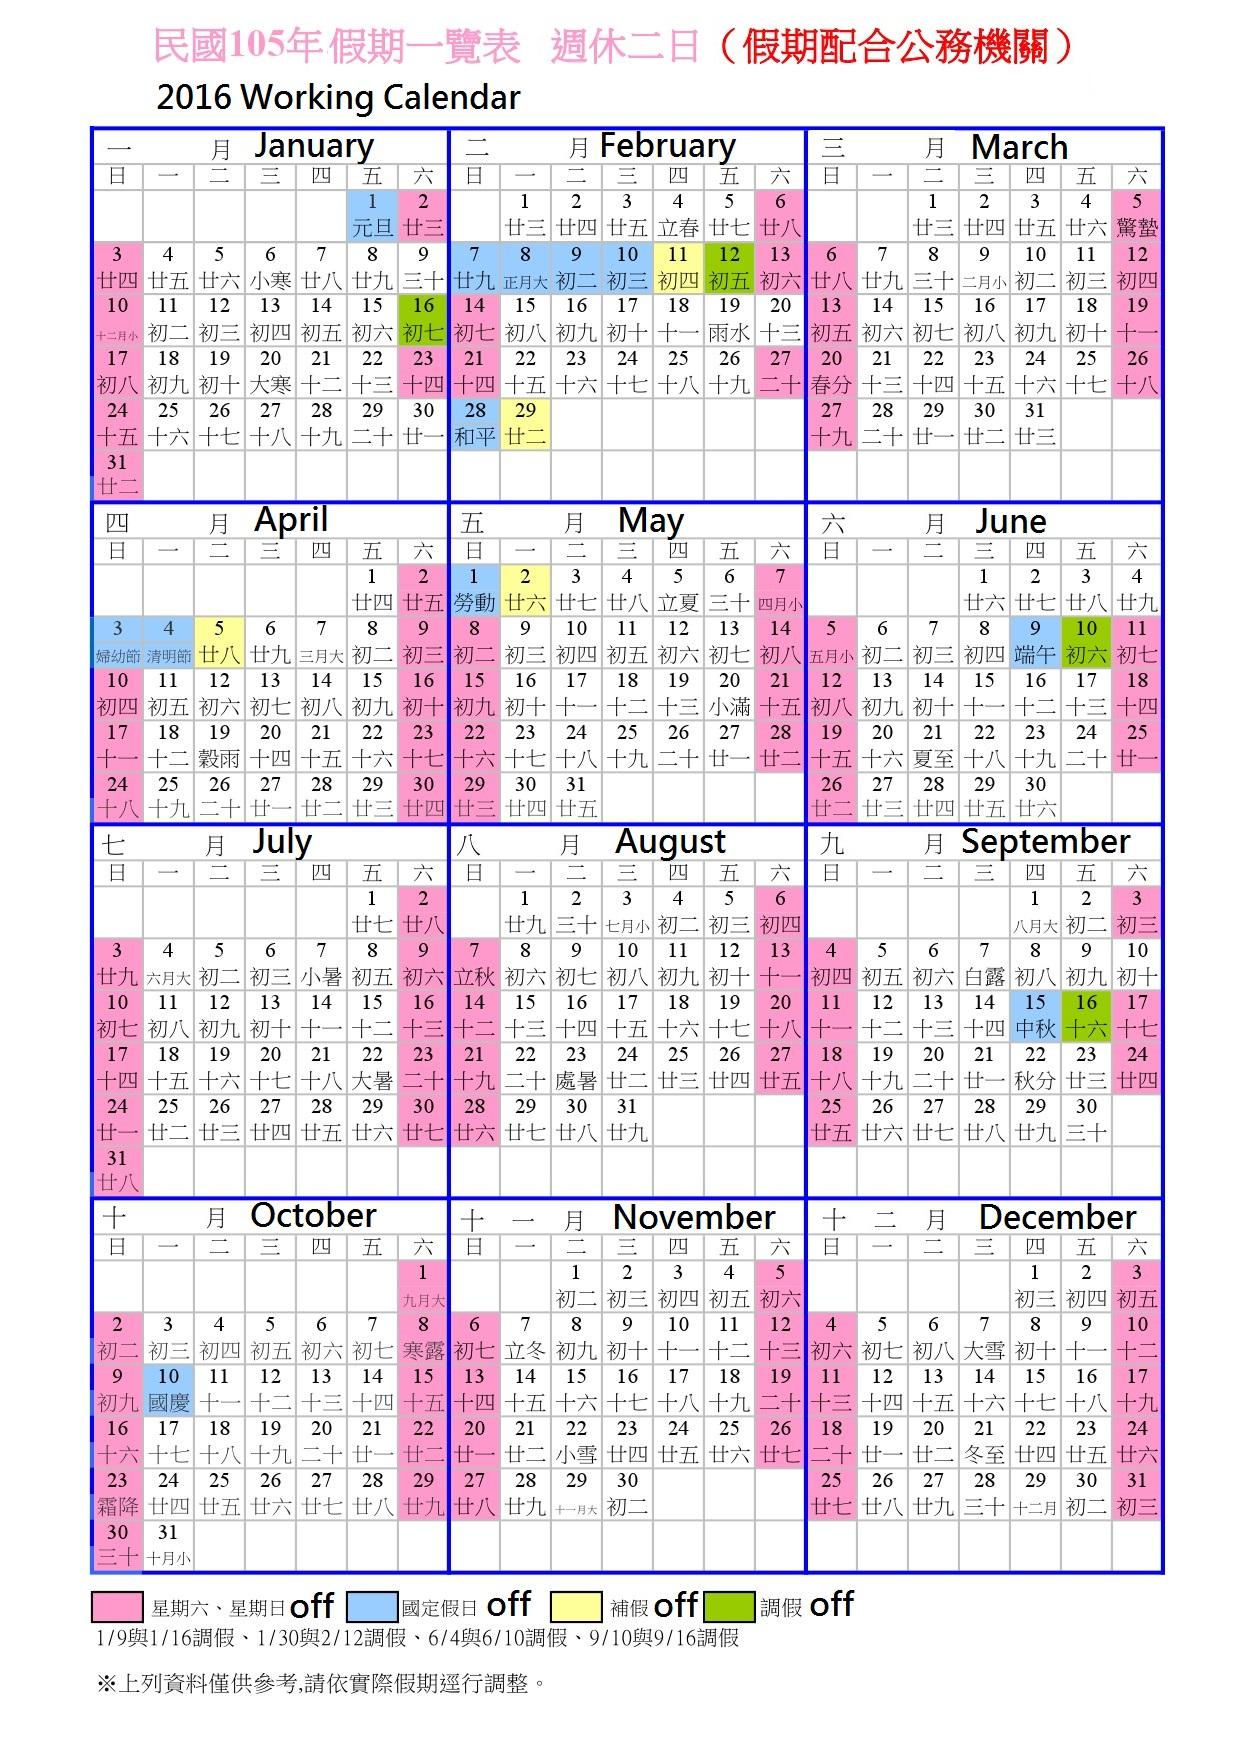 working calendar 2016 - Chinese New Year 2016 Calendar